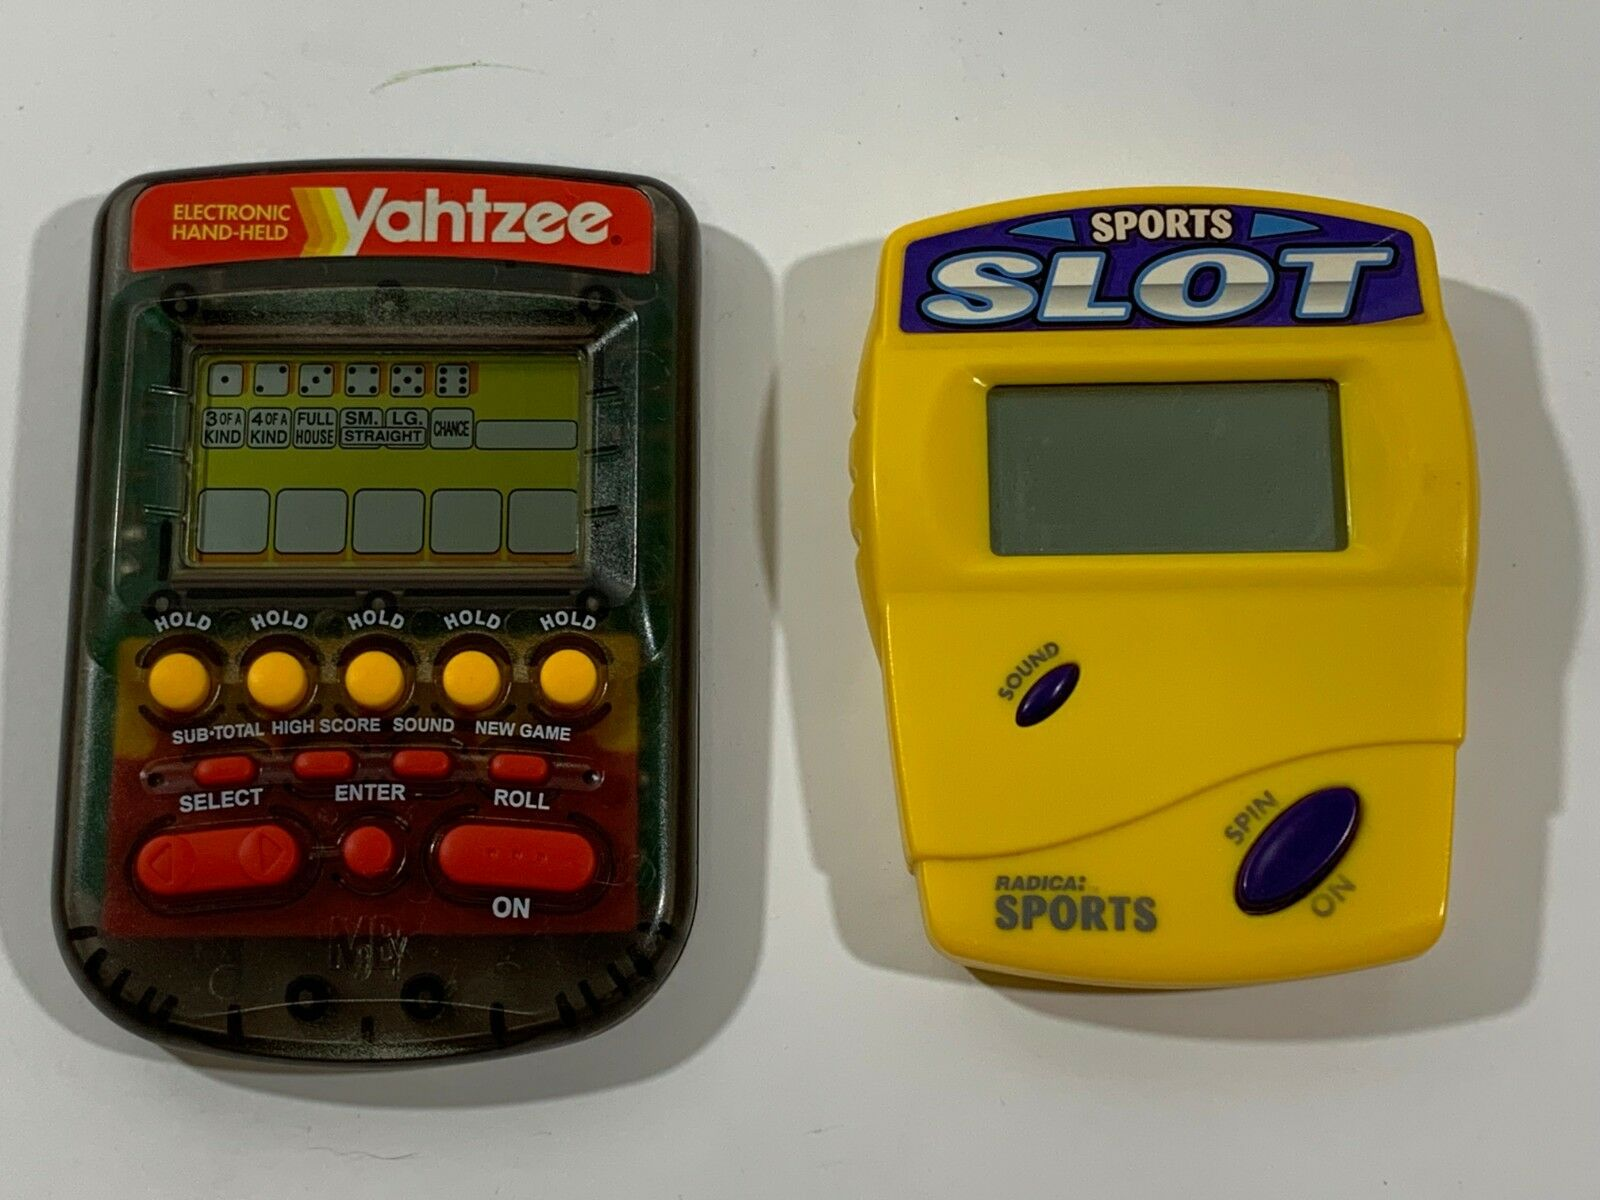 Lot of 2 - Radica SPORT CASINO SLOT & YAHTZEE Hand Held Electronic Game Tested